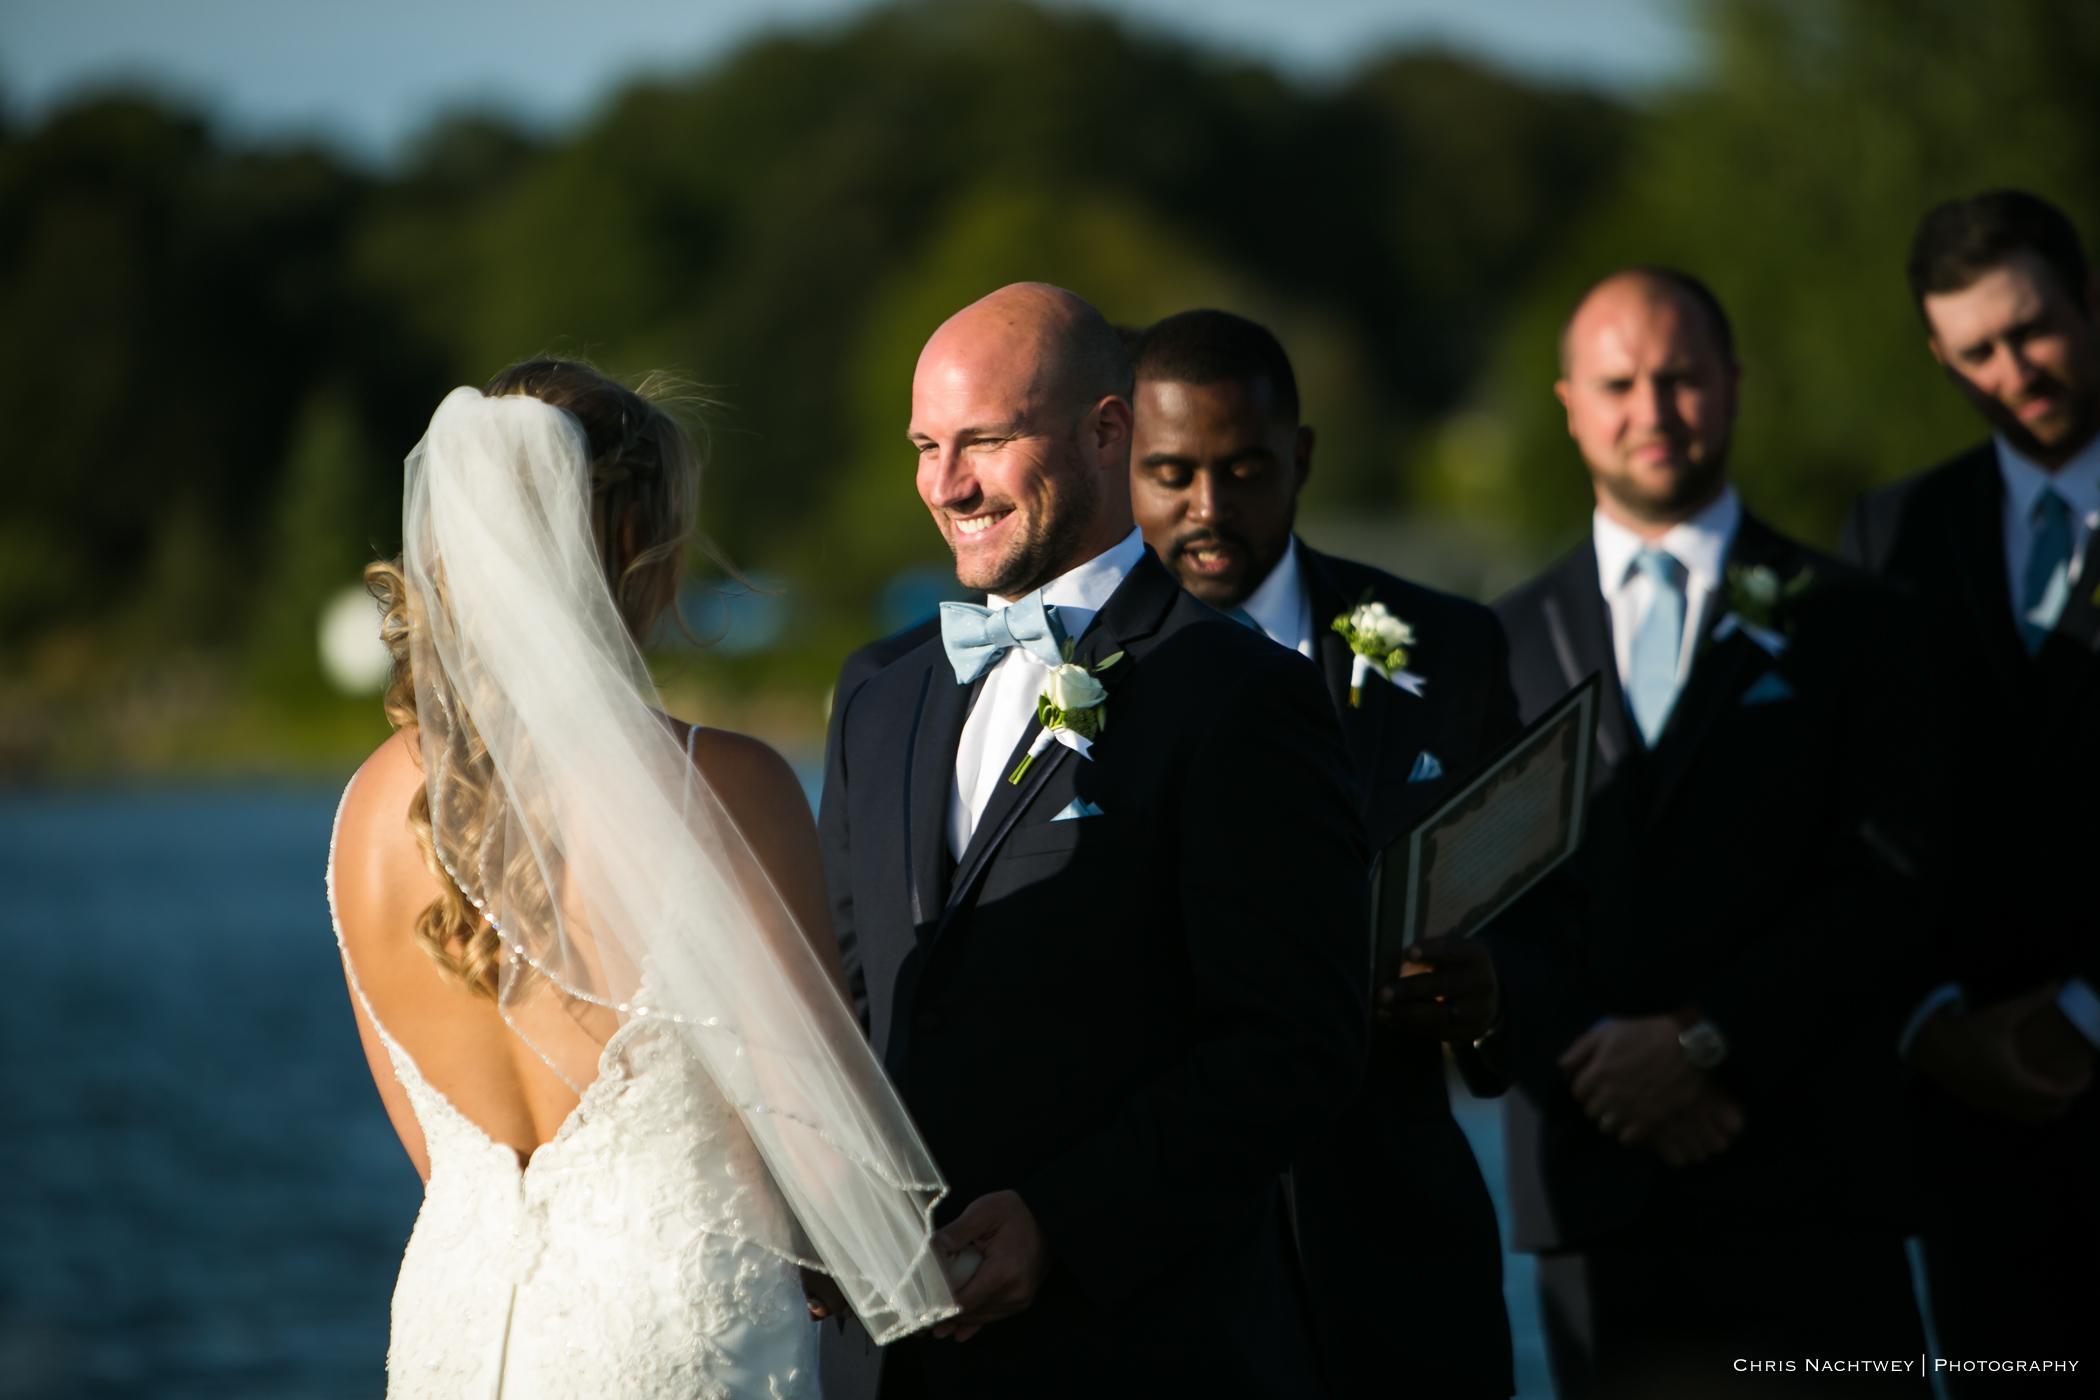 mystic-ct-artistic-wedding-photographers-chris-nachtwey-tany-mike-2017-36.jpg